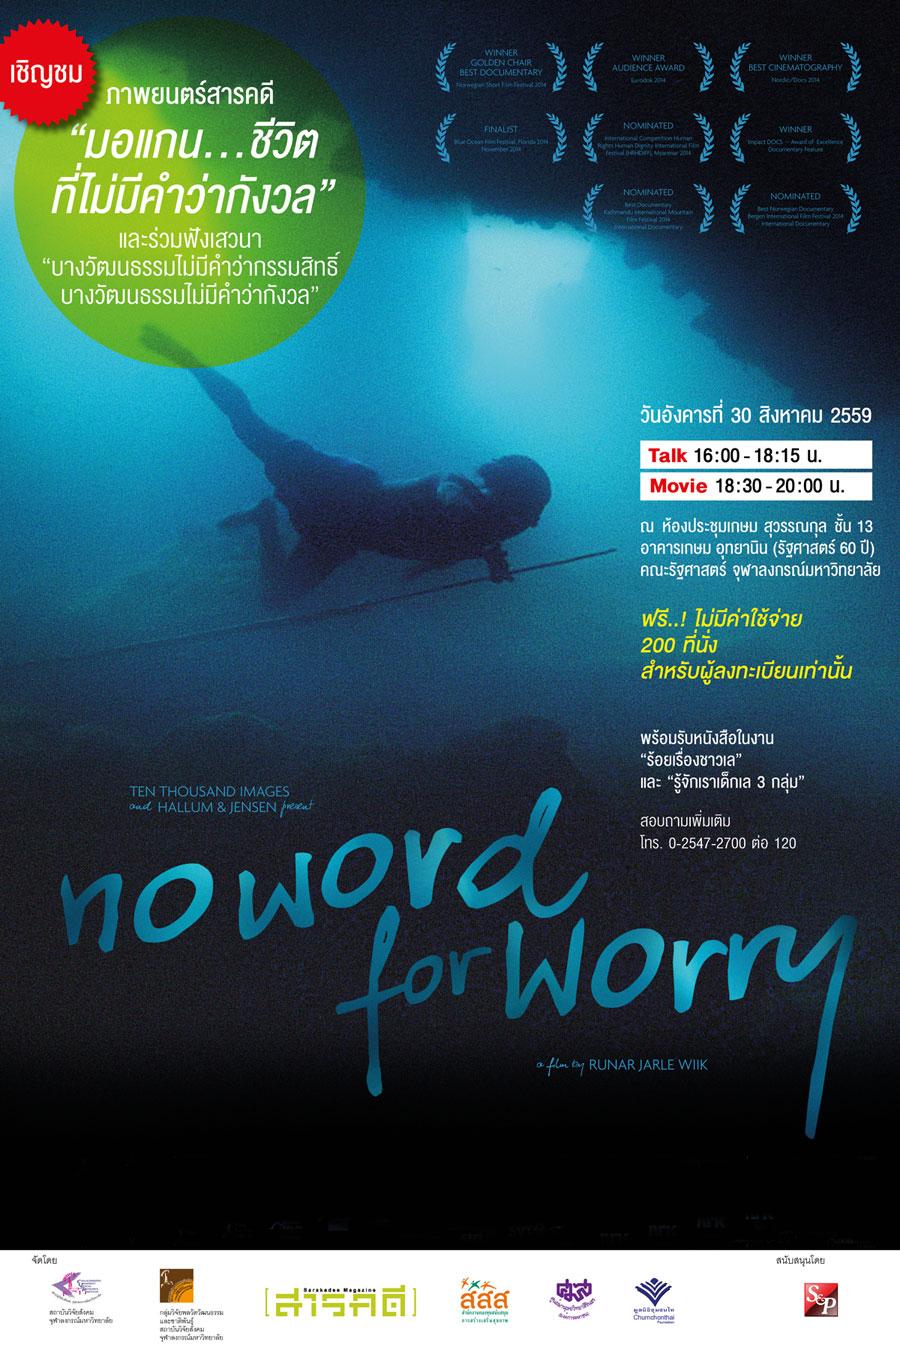 TALK & MOVIE ร่วมฟังเสวนาและชมภาพยนตร์  No word for worry มอแกน…ชีวิตที่ไม่มีคำว่ากังวล